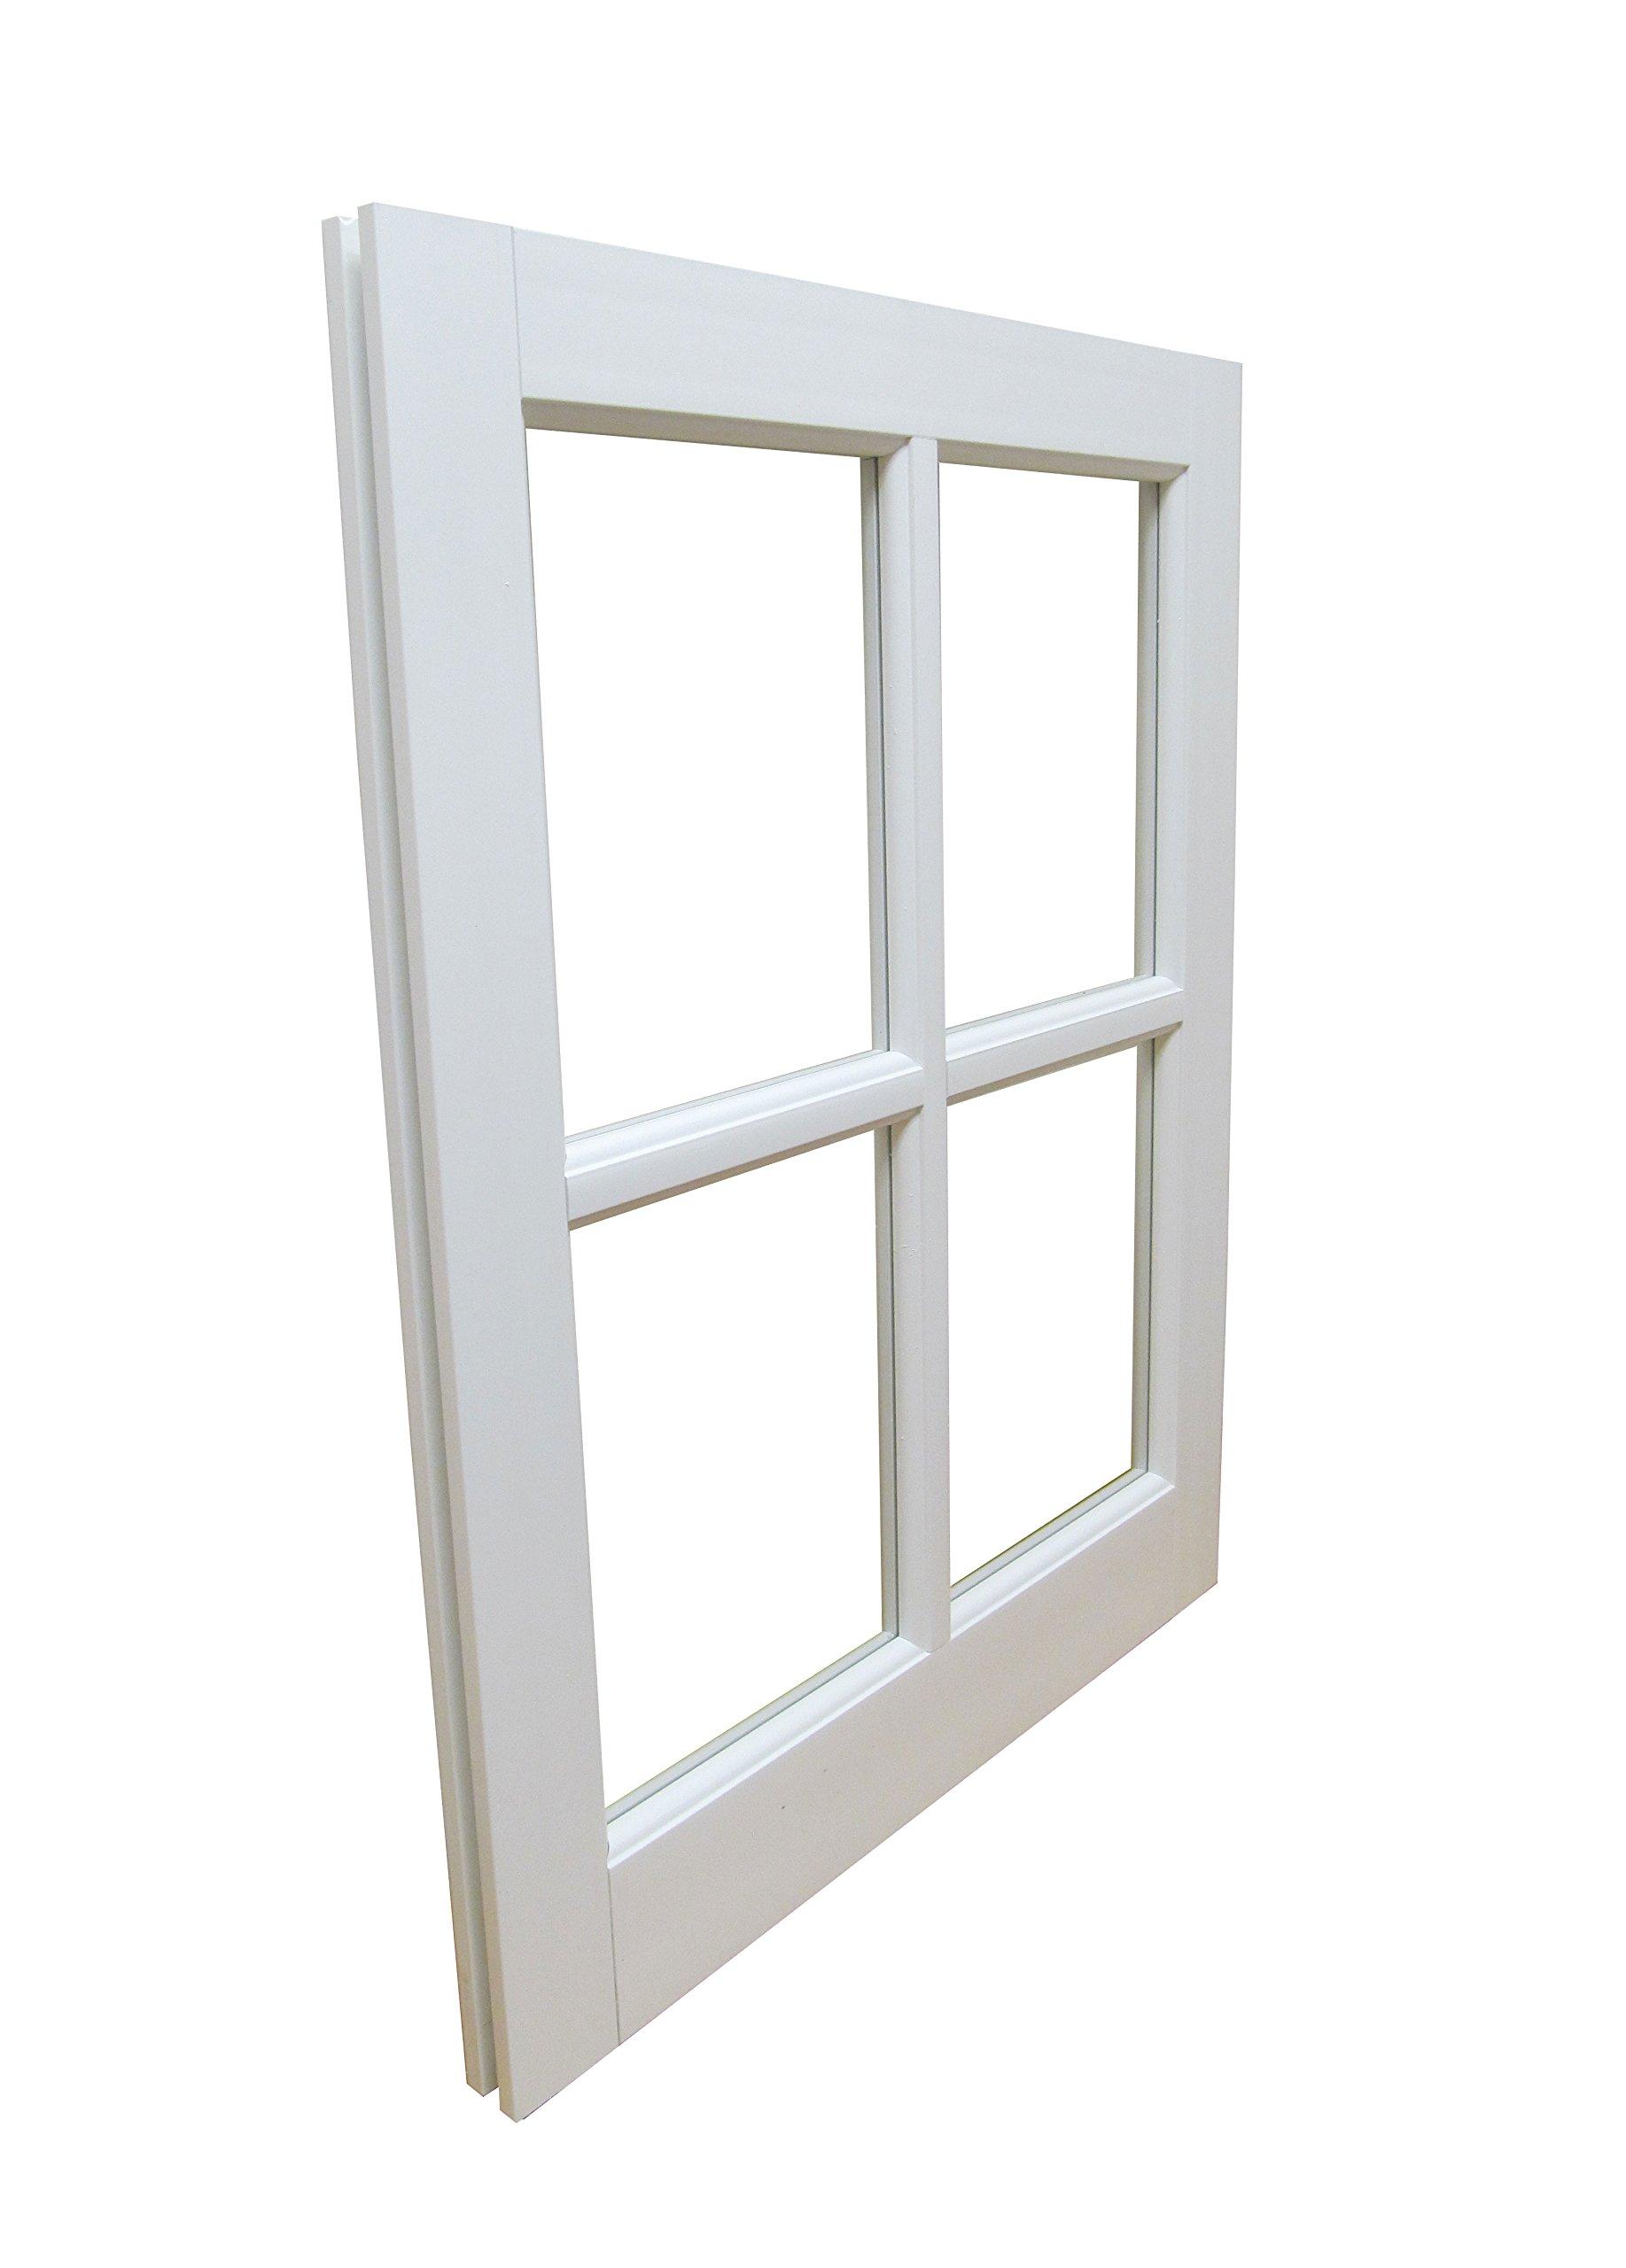 Barn Sash Window PVC 20'' x 25'' Traditional Style 4 lite